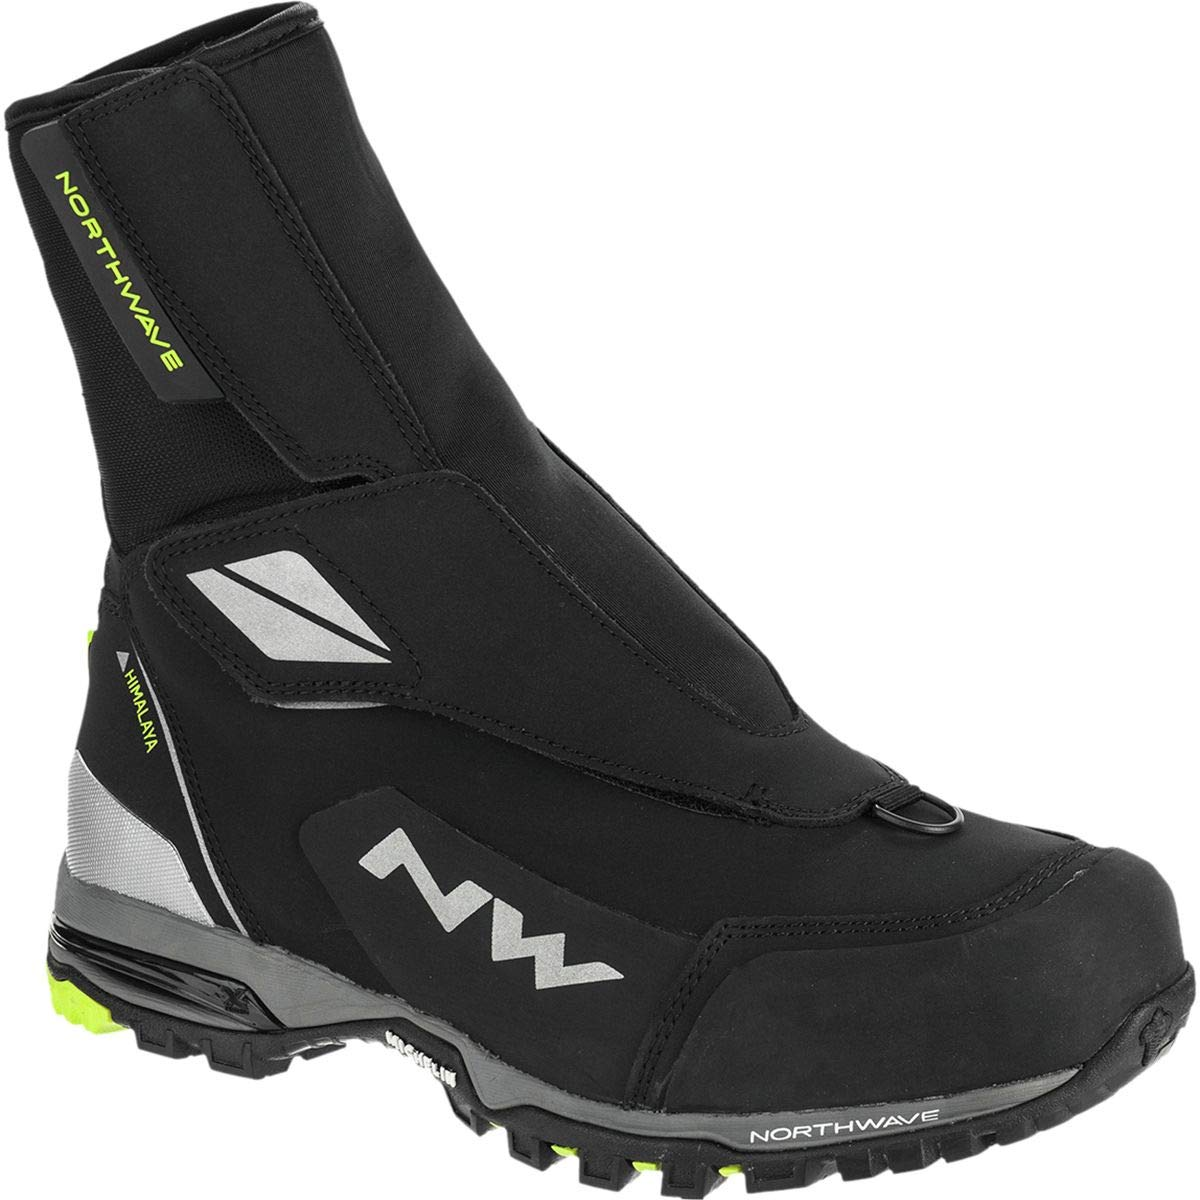 Northwave Himalaya Cycling Shoe Mens